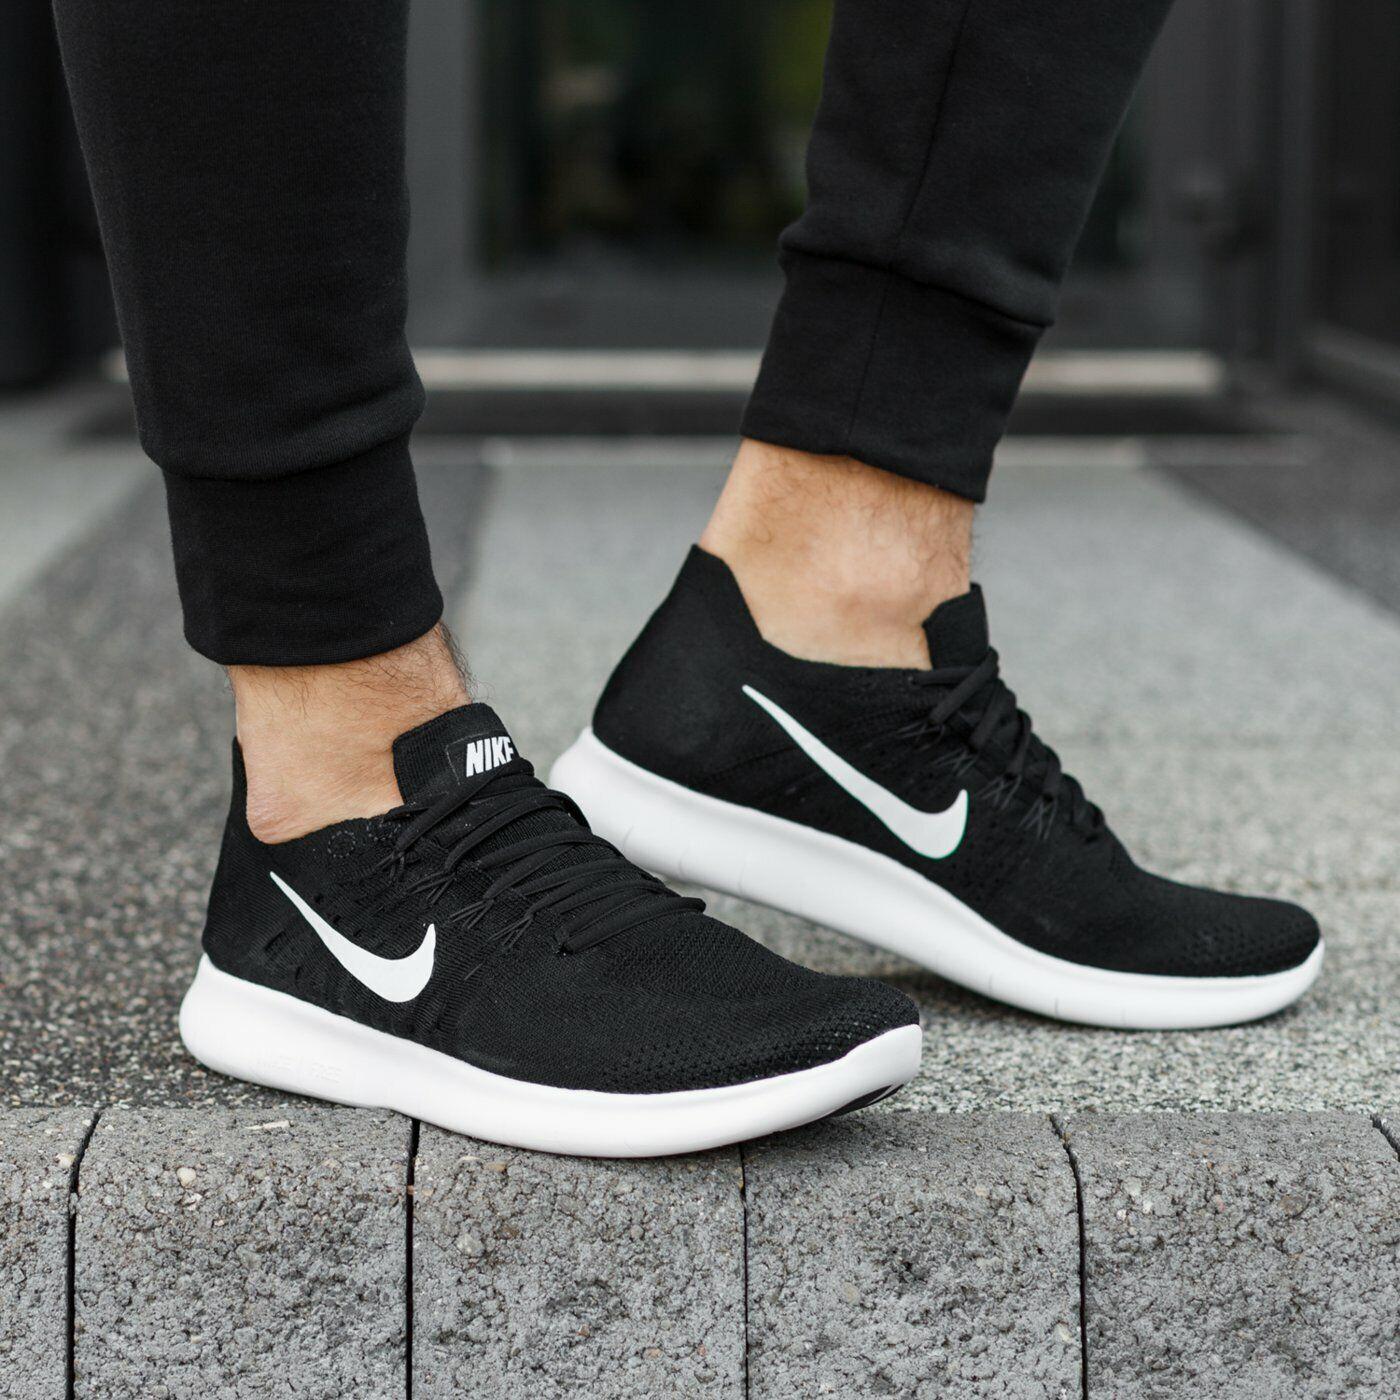 Nike Free RN Flyknit 2017 White Black Men's Running shoes Size 11.5 NEW